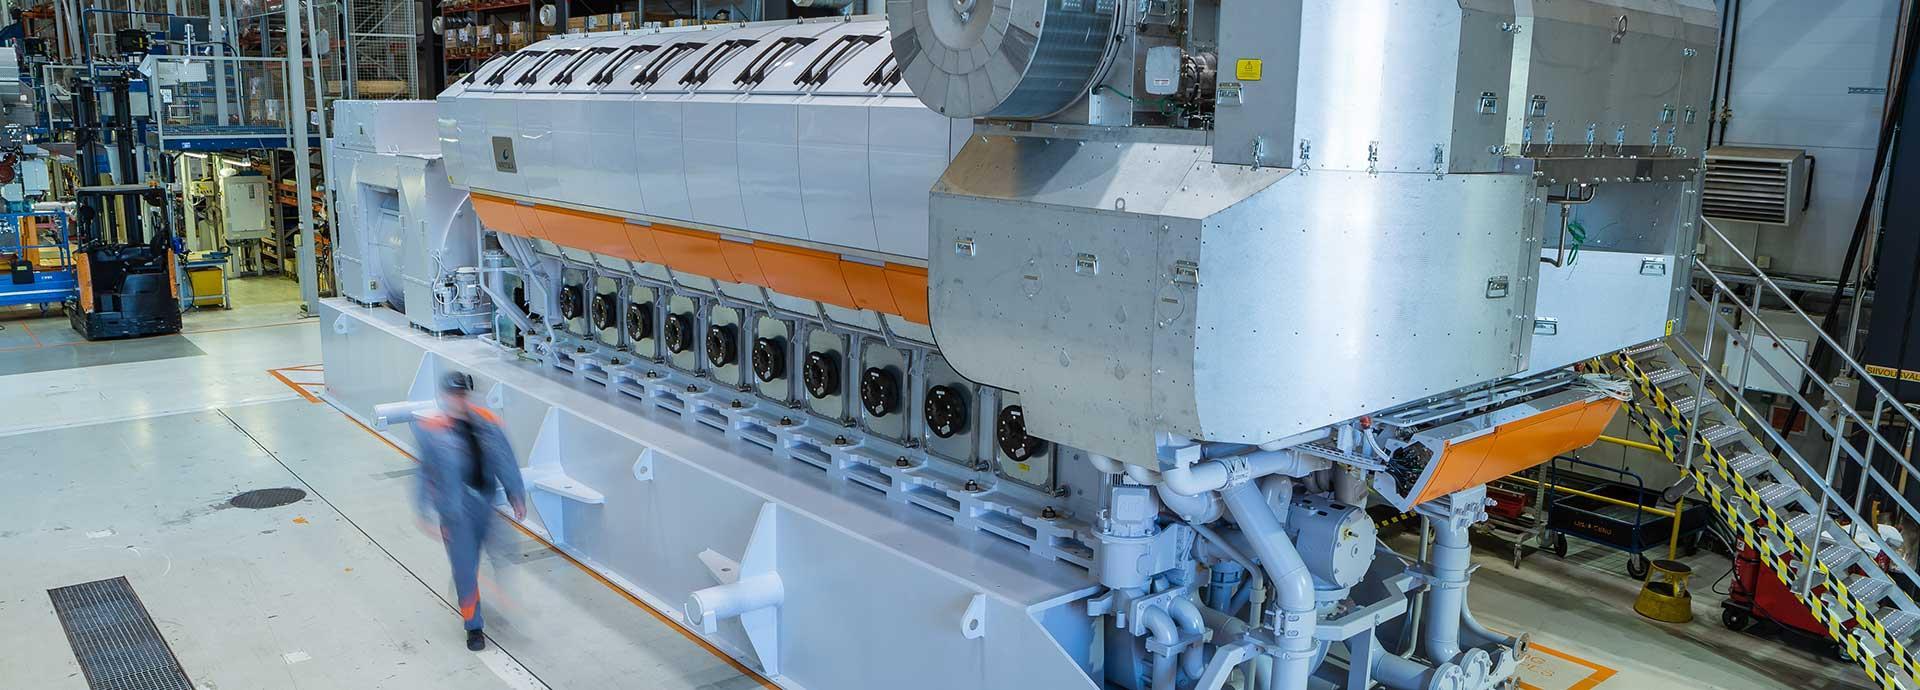 Wärtsilä 31SG the world's most efficient 4-stroke engine